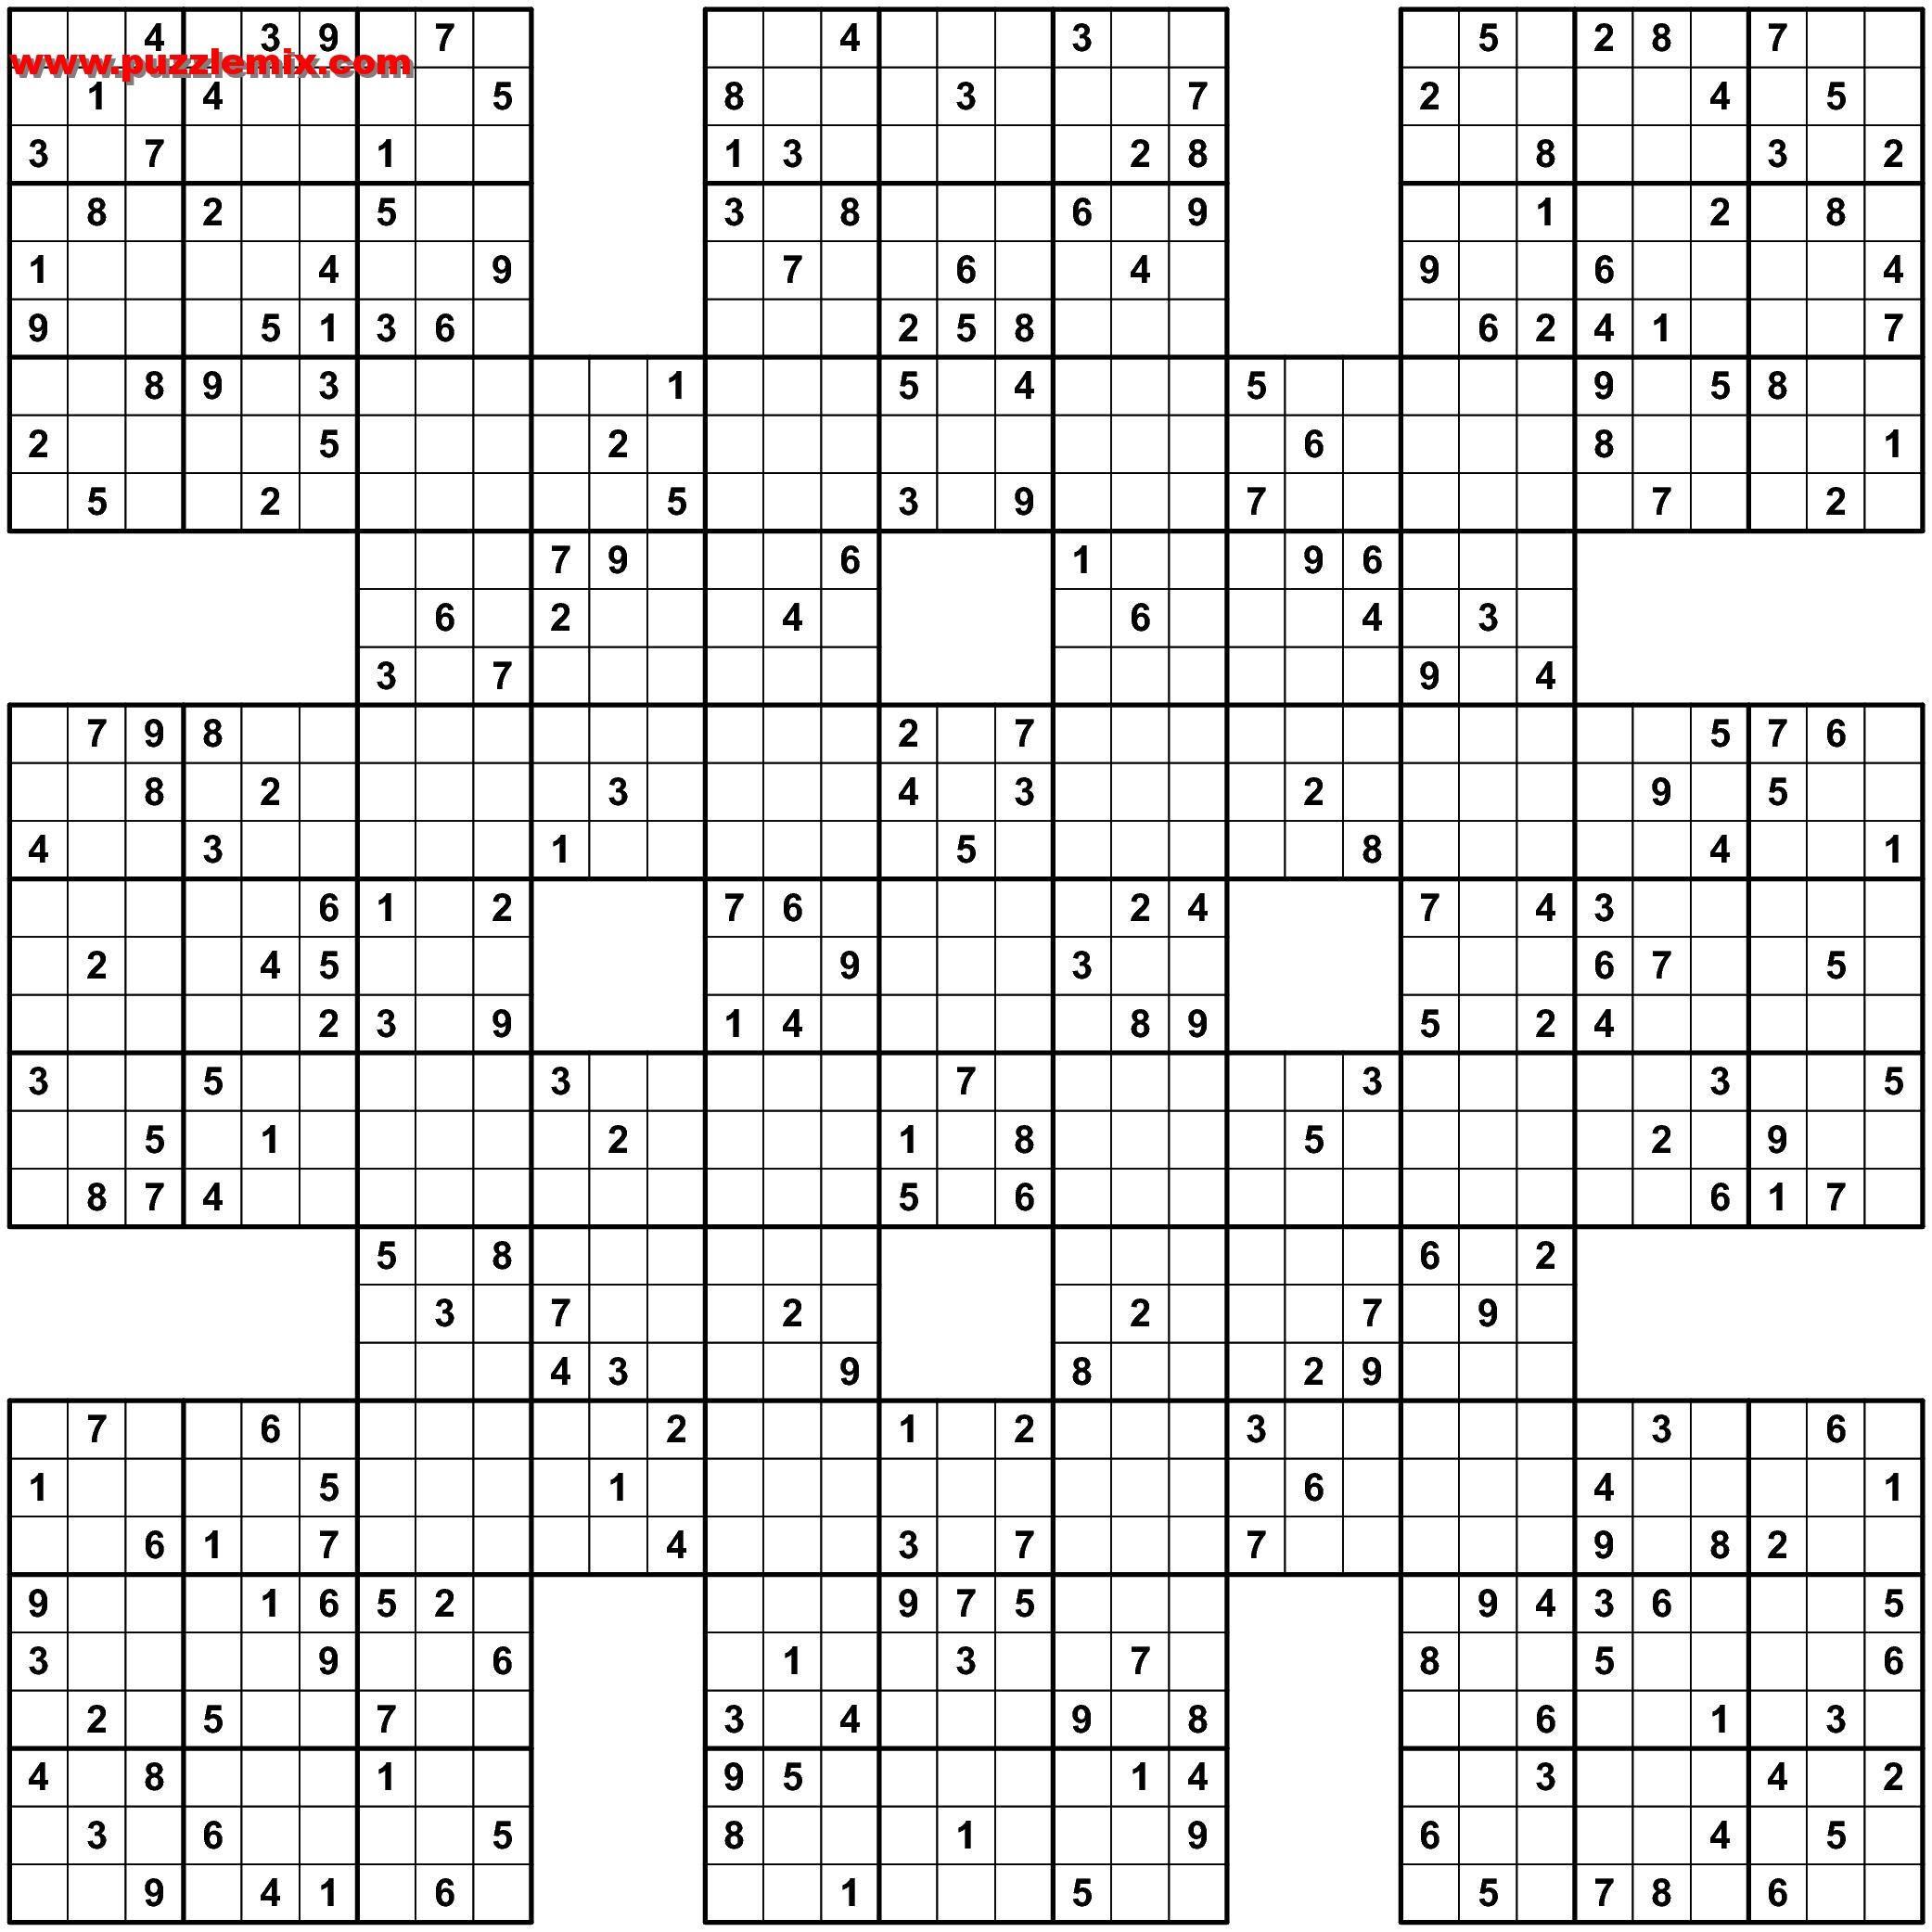 Pindiane Shepard On 13Grid 1   Pinterest   Sudoku Puzzles, Word - Sudoku 16X16 Printable Free